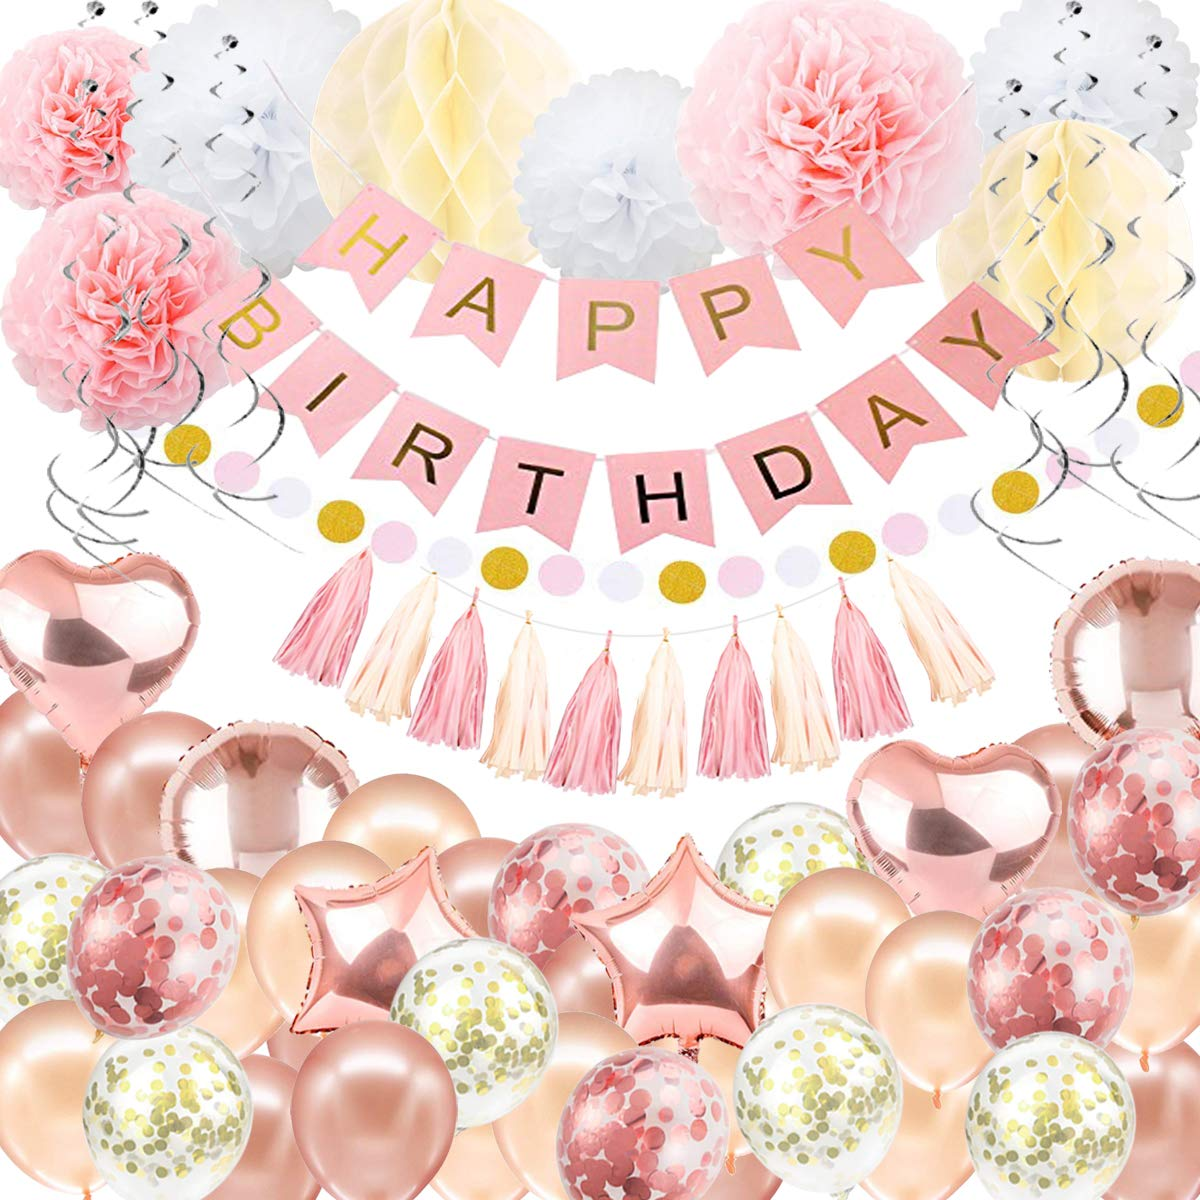 Birthday Decorations Balloon Banner Rose Gold Happy Decoration 16th 18th 21st 30th 50th 60th Balloons